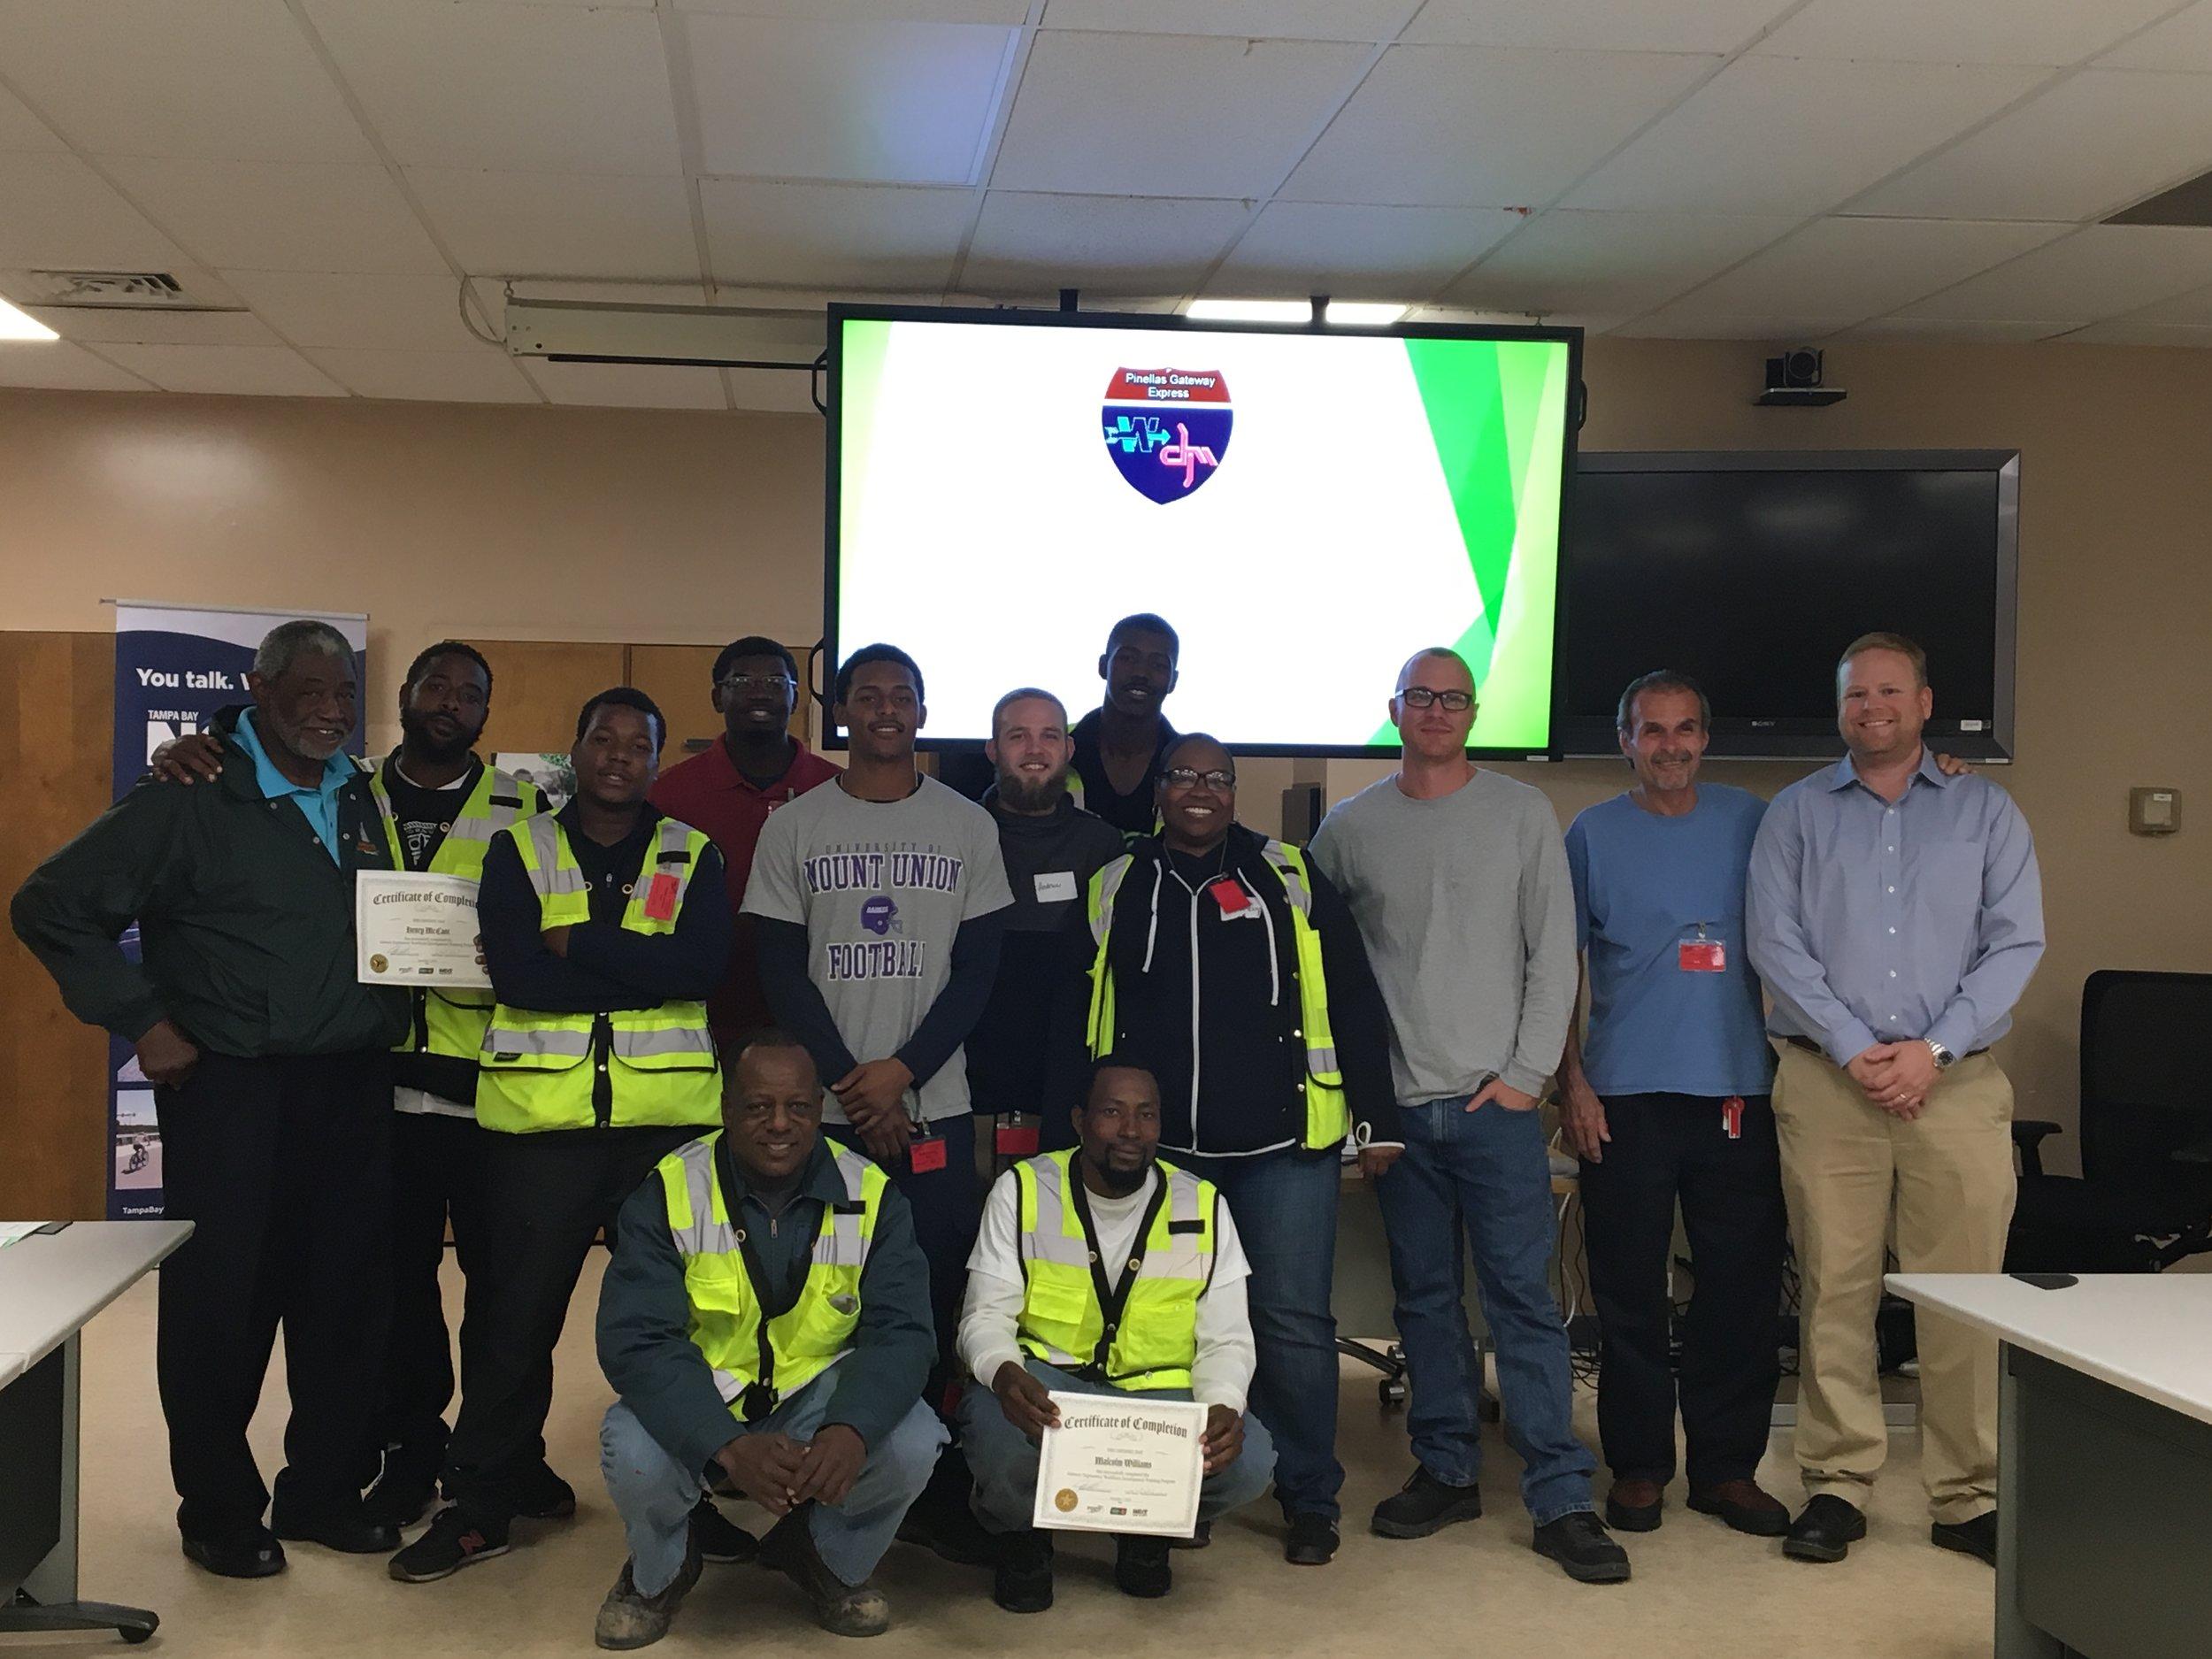 FDOT Gateway Construction project GRADUATES!